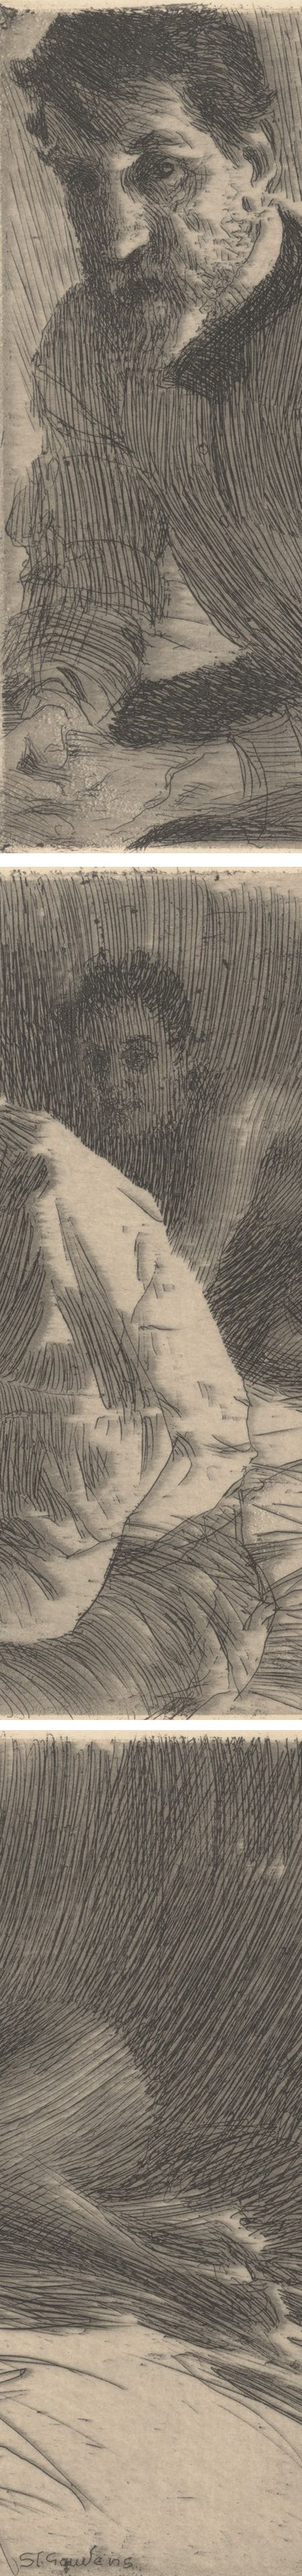 Augustus Saint Gaudens II (Saint Gaudens and his Model), Anders Zorn, etching (details)